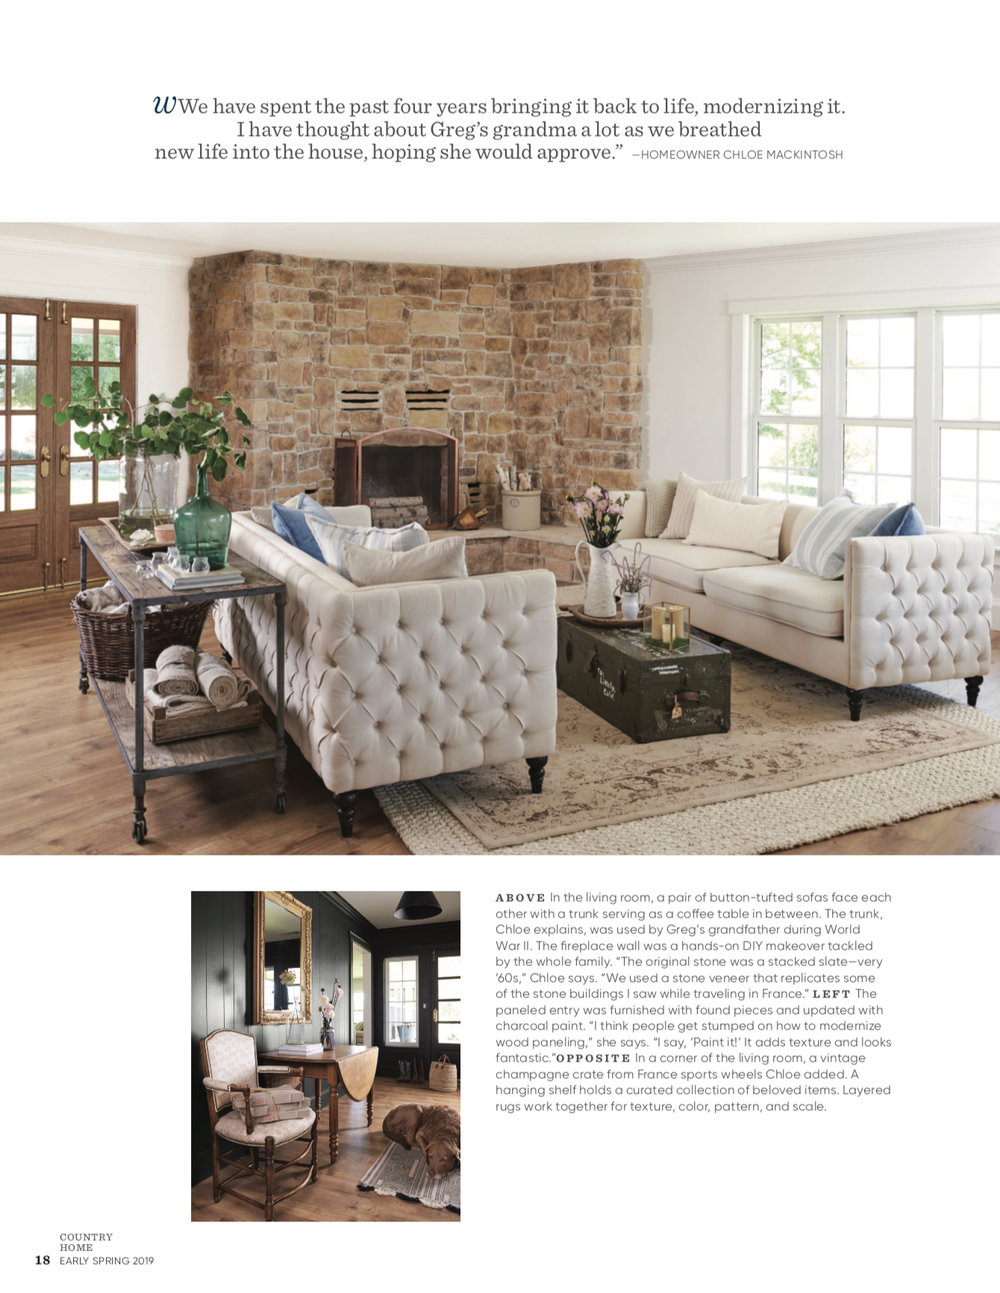 Farmhouse+living+room+design+with+stone+veneer+fireplace+and+tufted+couches+|+#farmhousedecor+#farmhouselivingroom copy.jpg